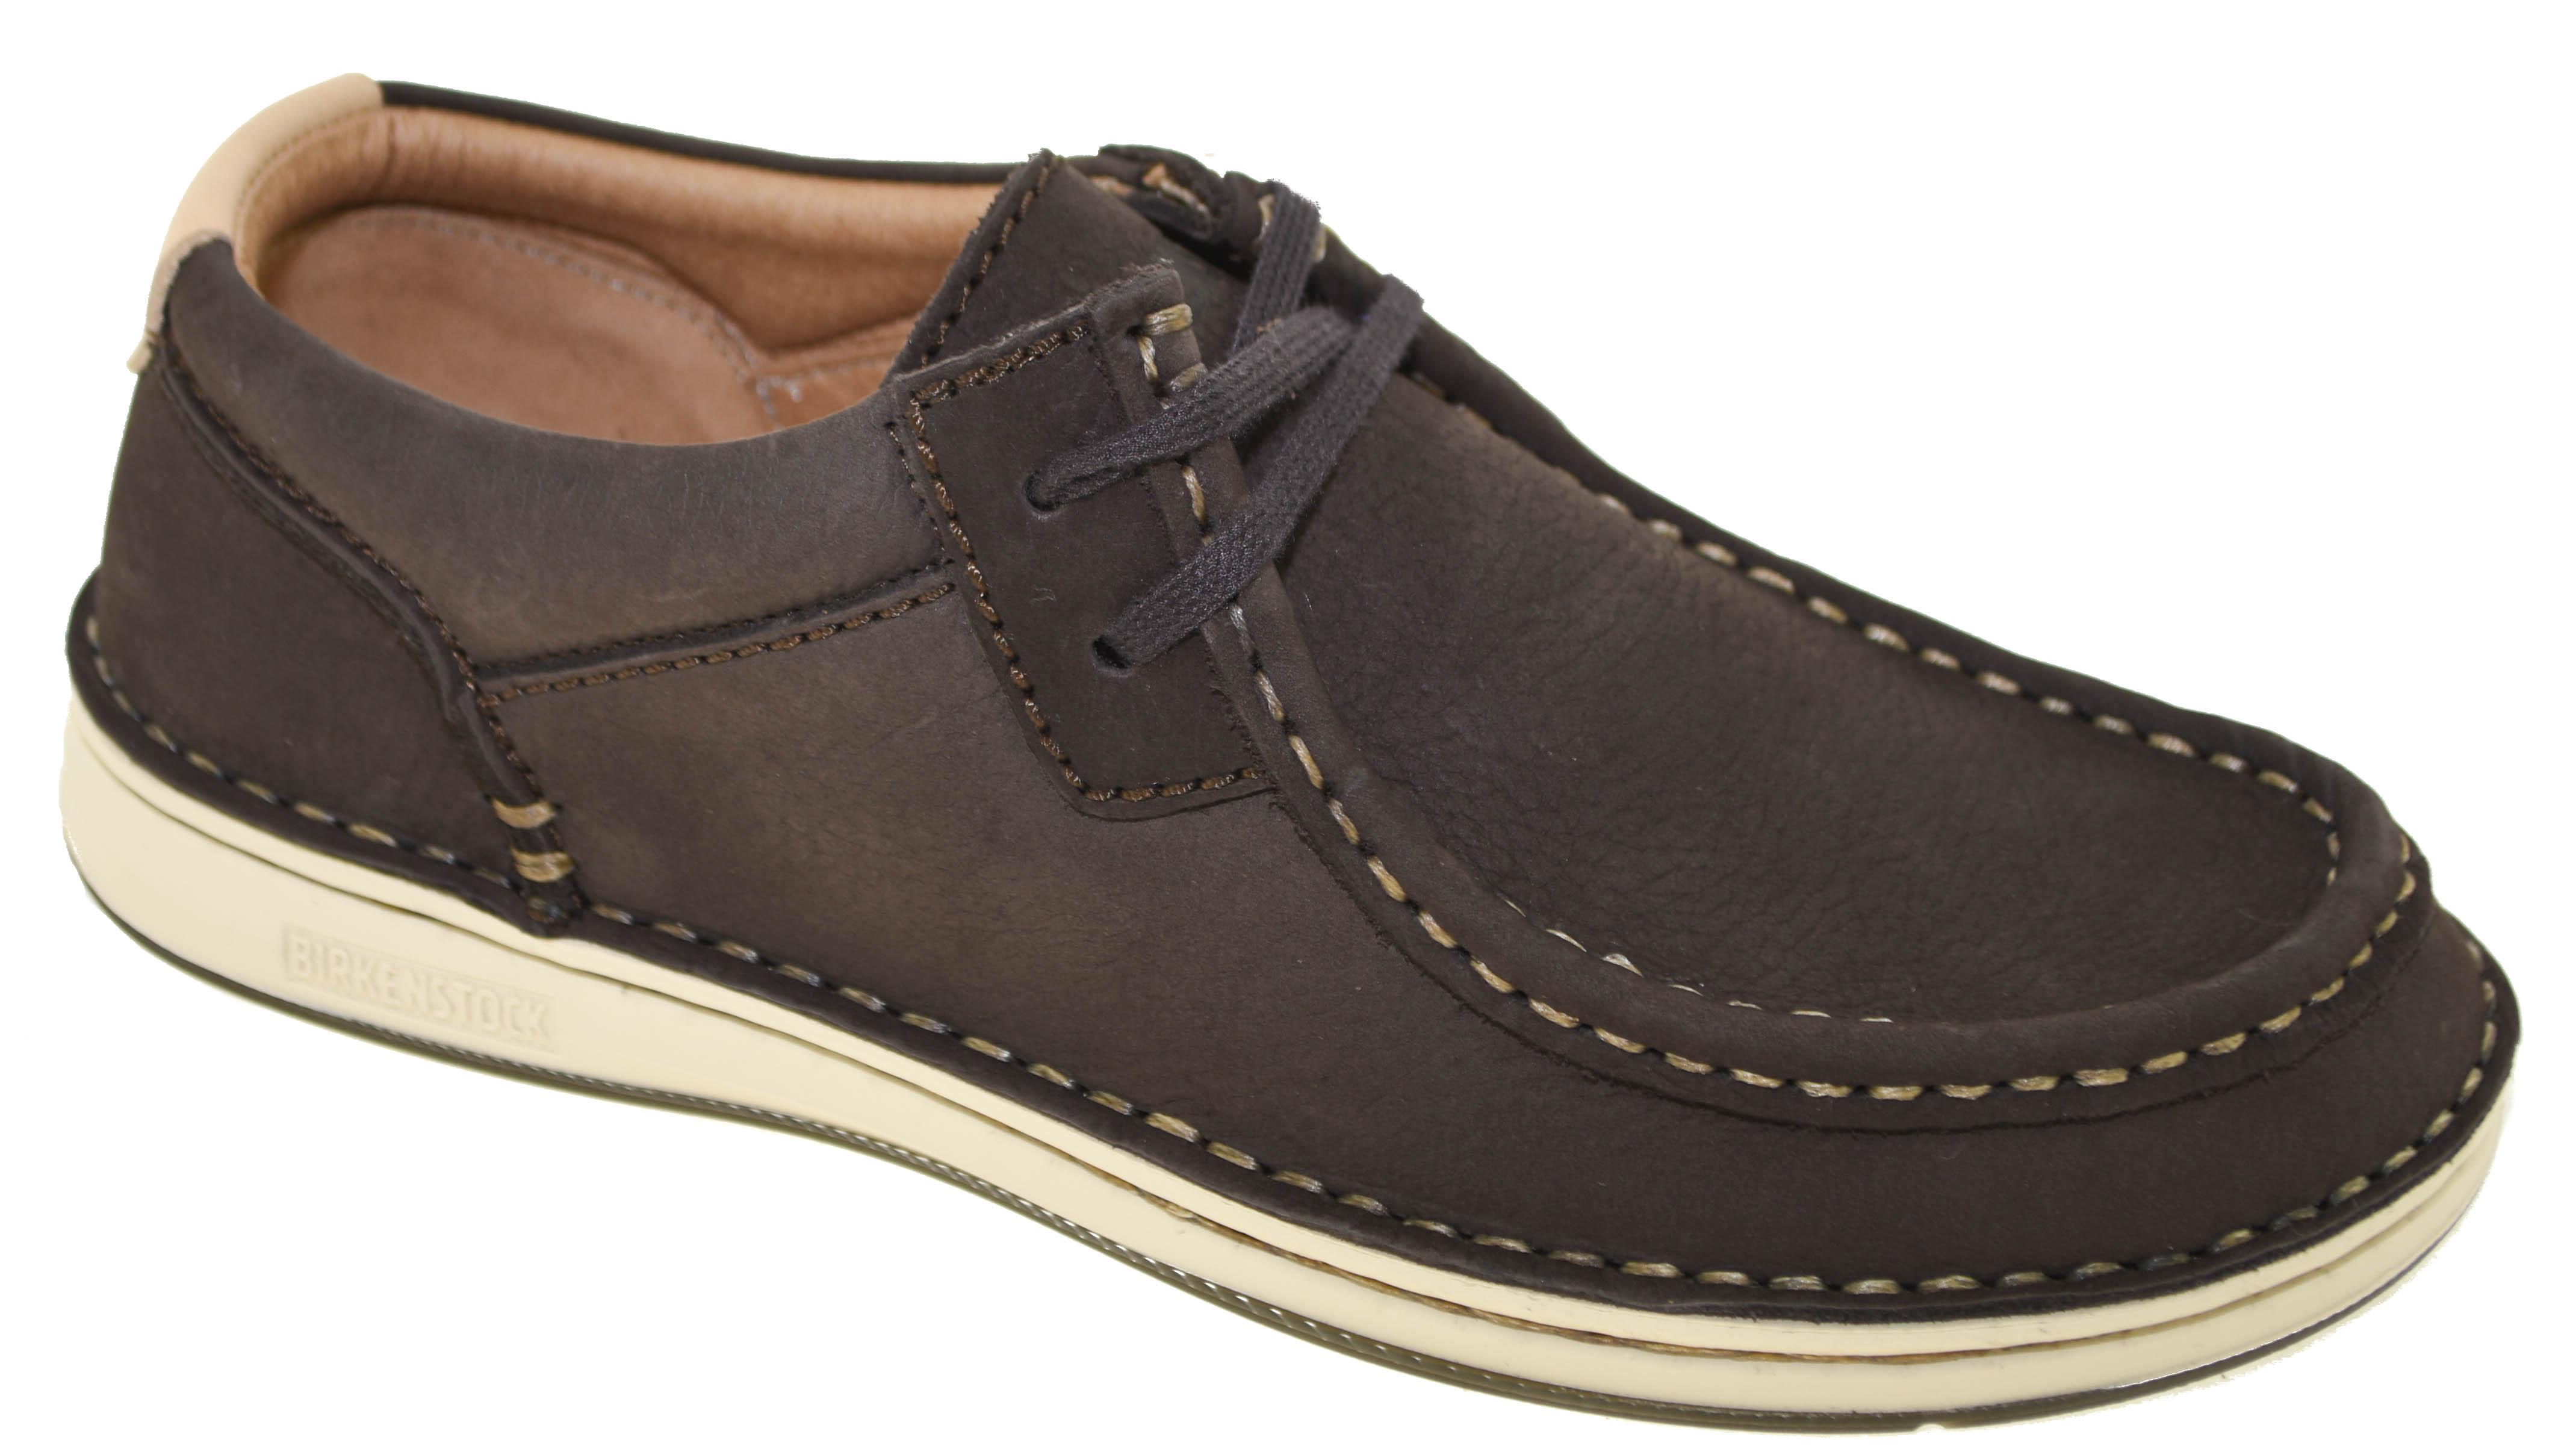 2572464d59c Birkenstock Women s Pasadena Shoe Mocha Style 1009840